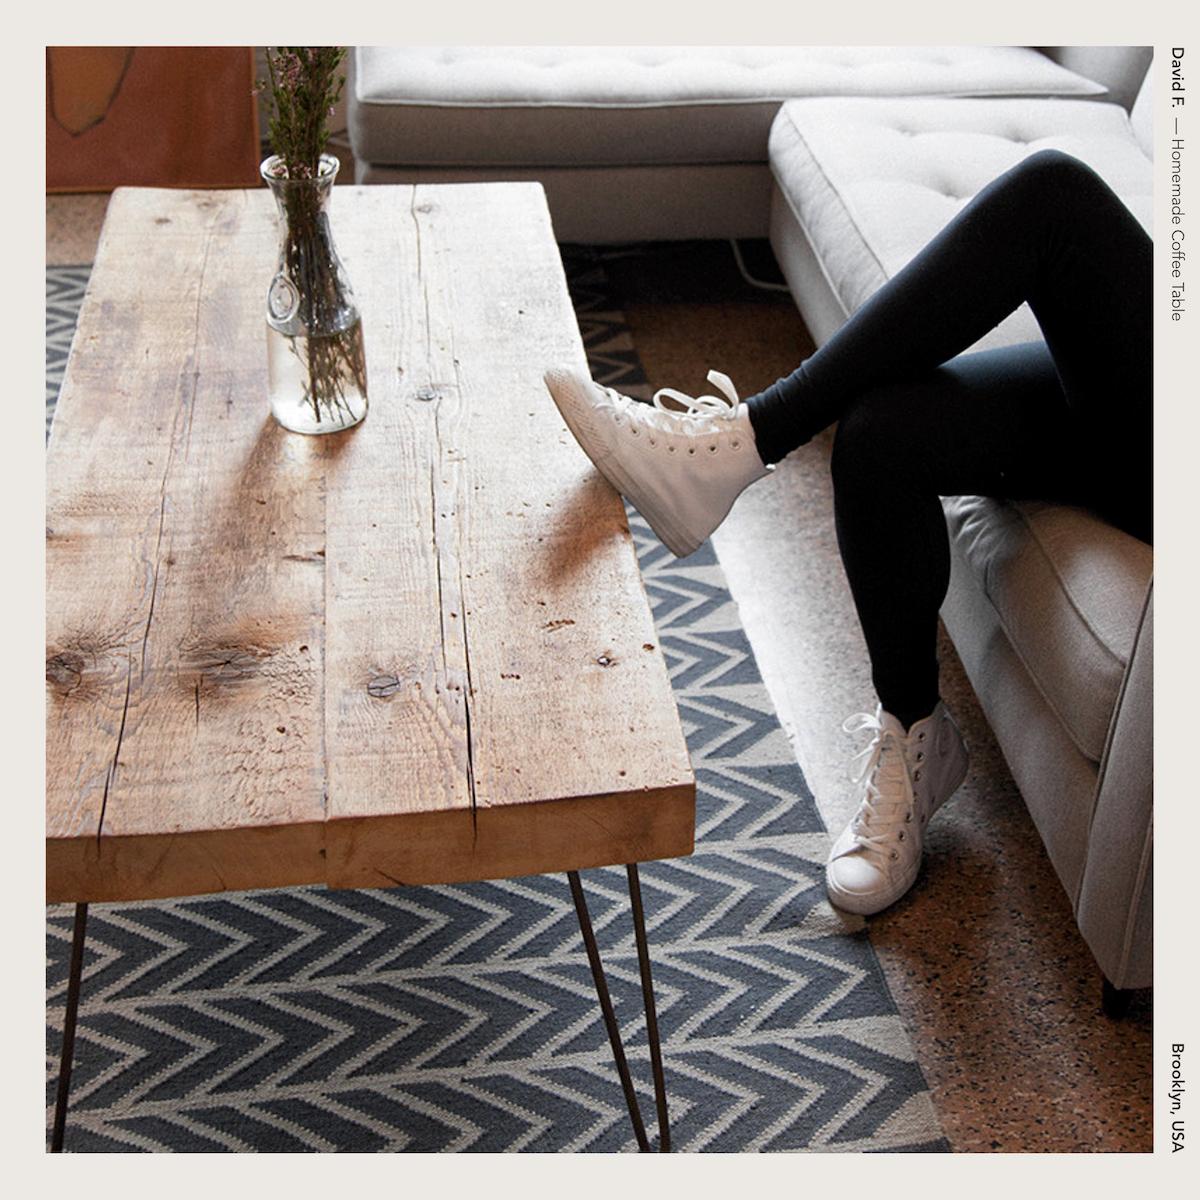 David F. — Homemade Coffee Table